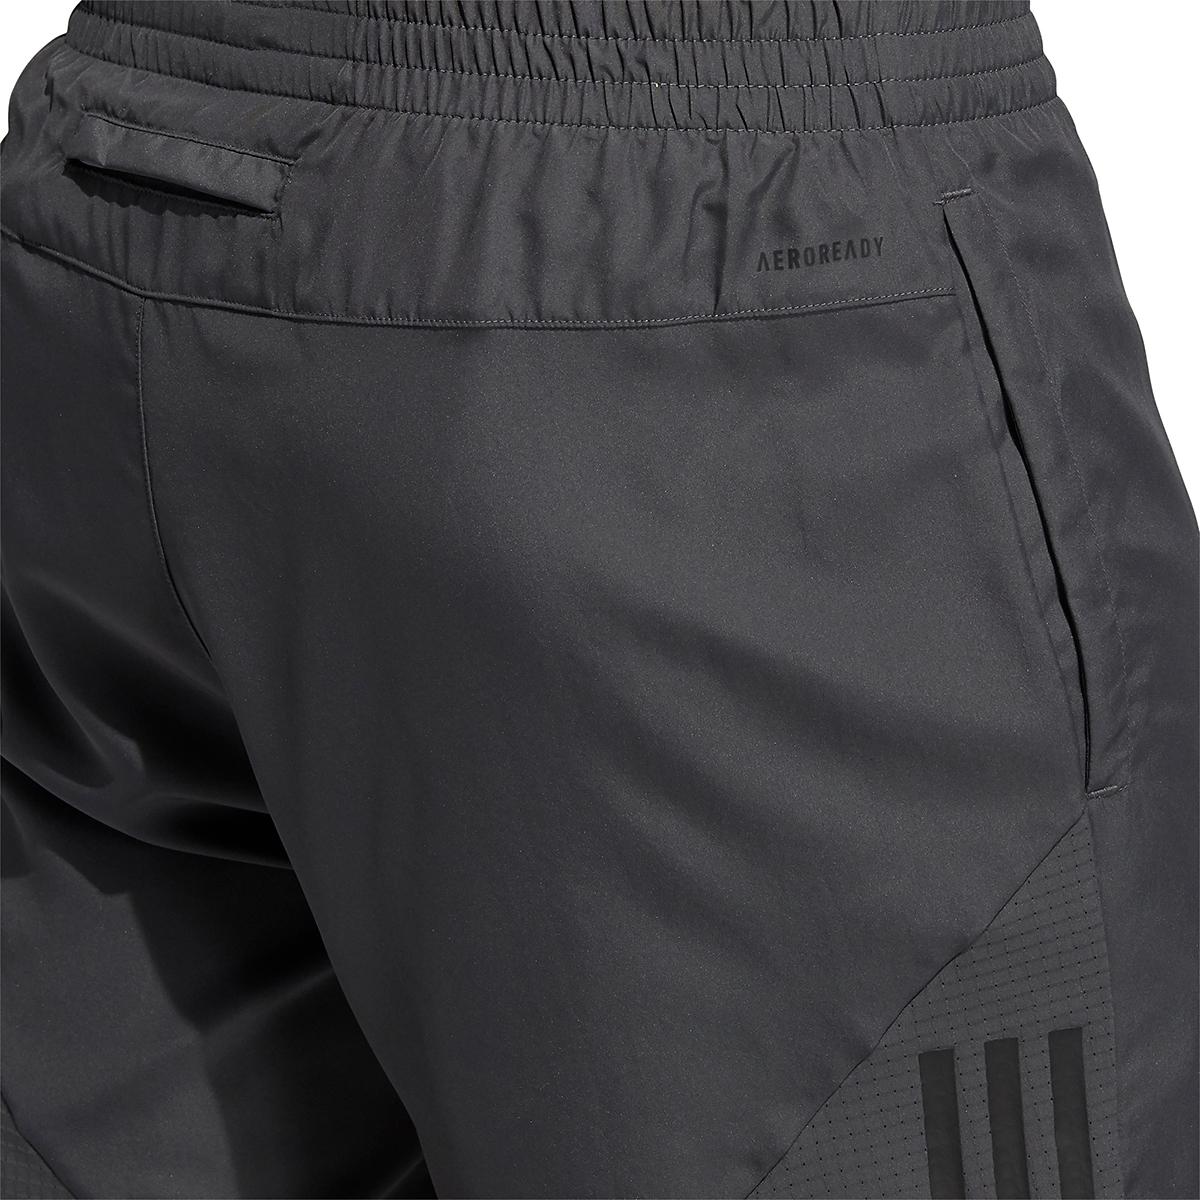 Men's Adidas Own The Run Shorts, , large, image 5